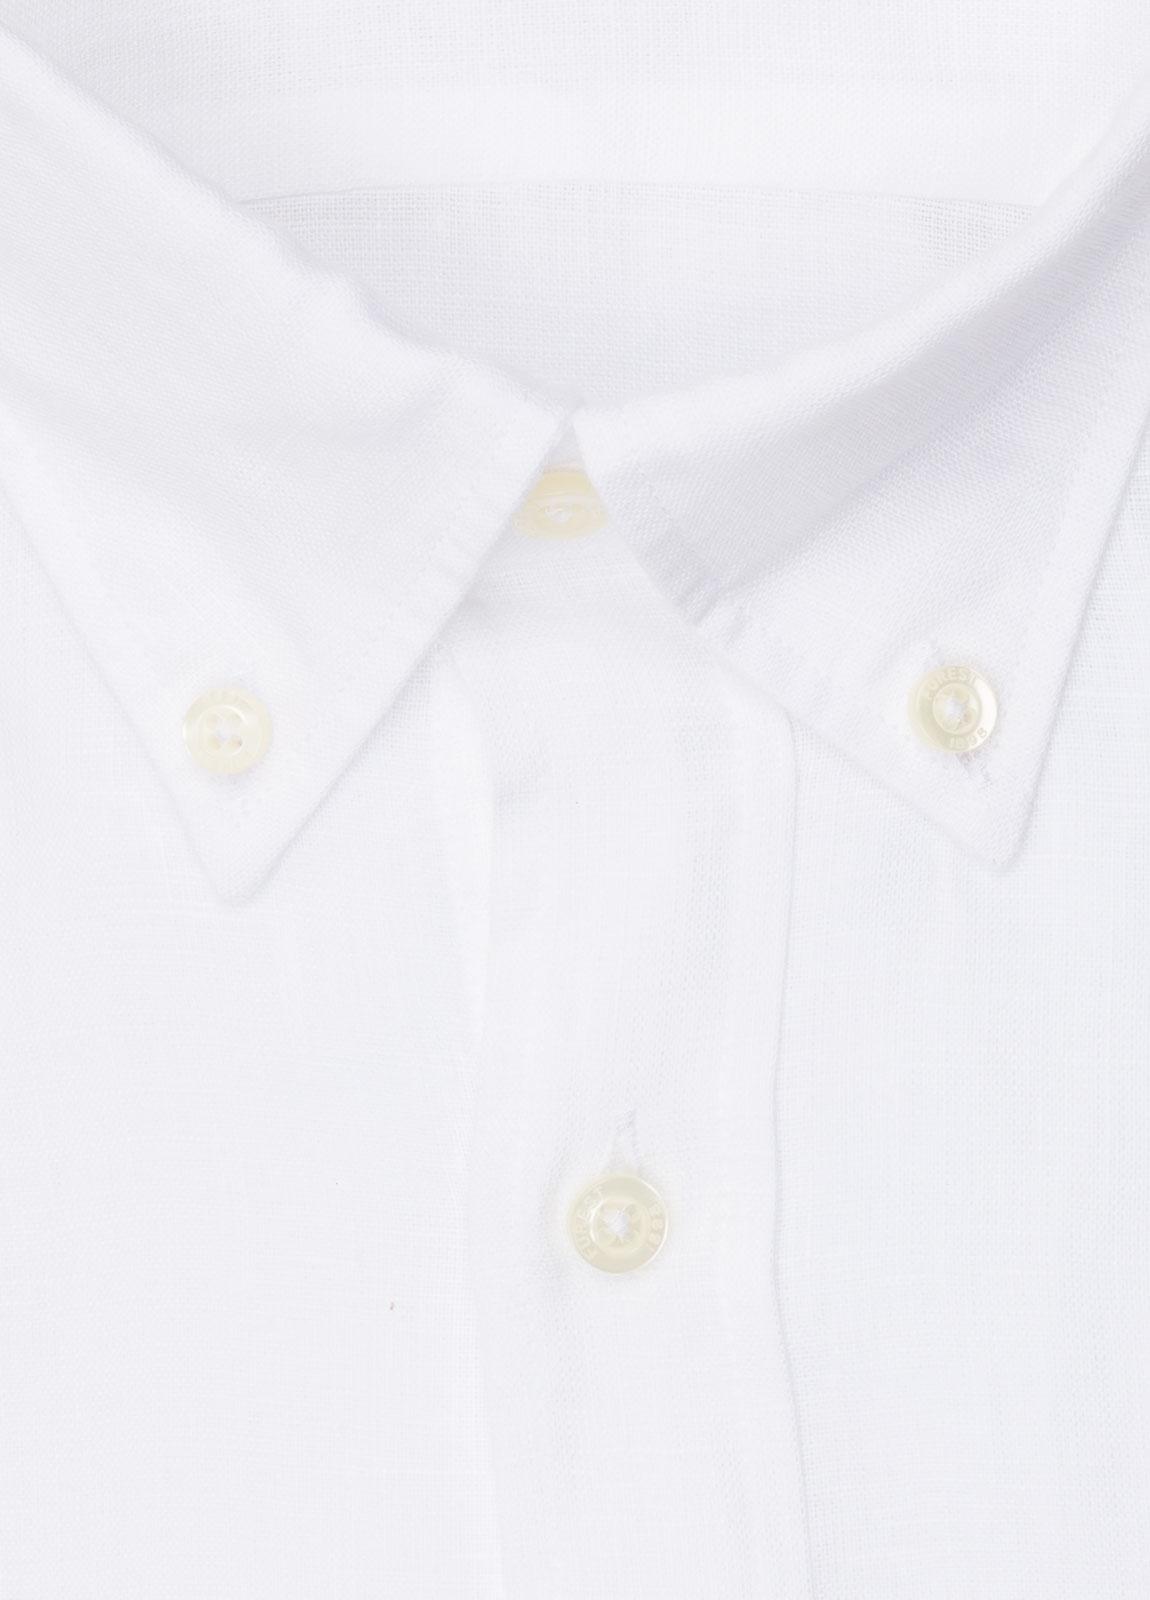 Camisa sport FUREST COLECCIÓN REGULAR FIT Lino blanco - Ítem1